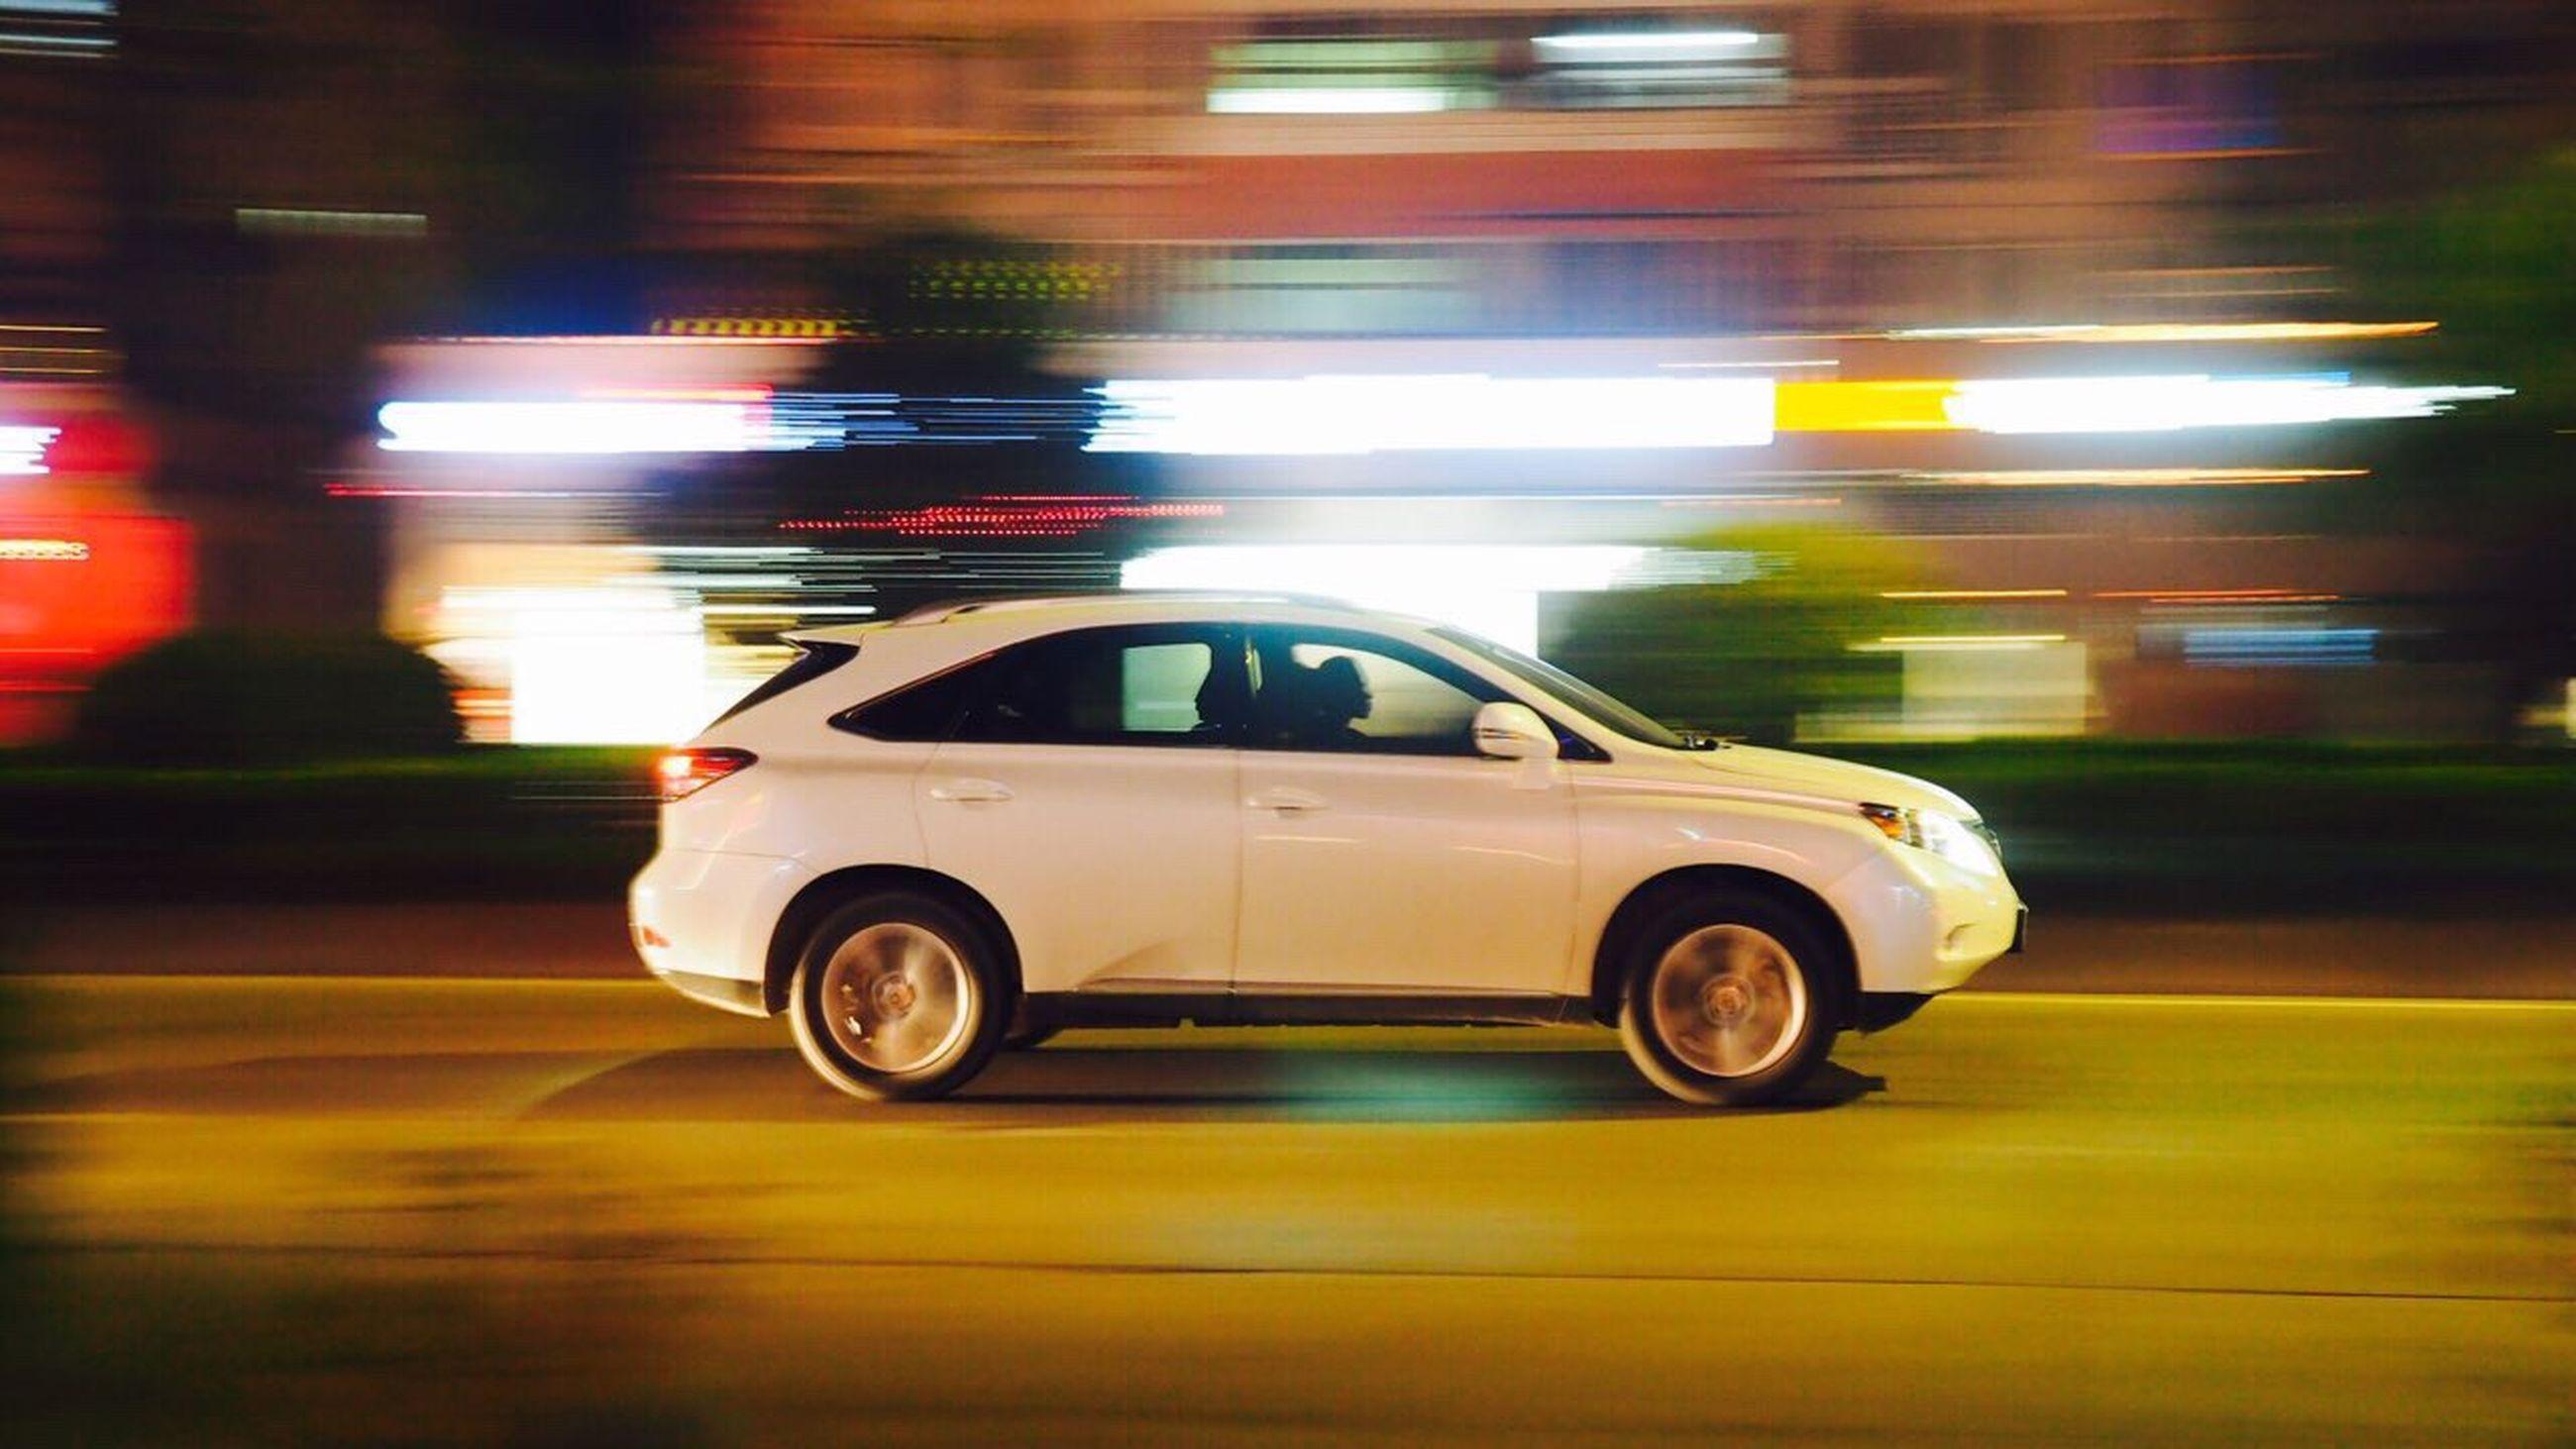 car, transportation, mode of transport, land vehicle, speed, illuminated, blurred motion, motion, night, no people, outdoors, racecar